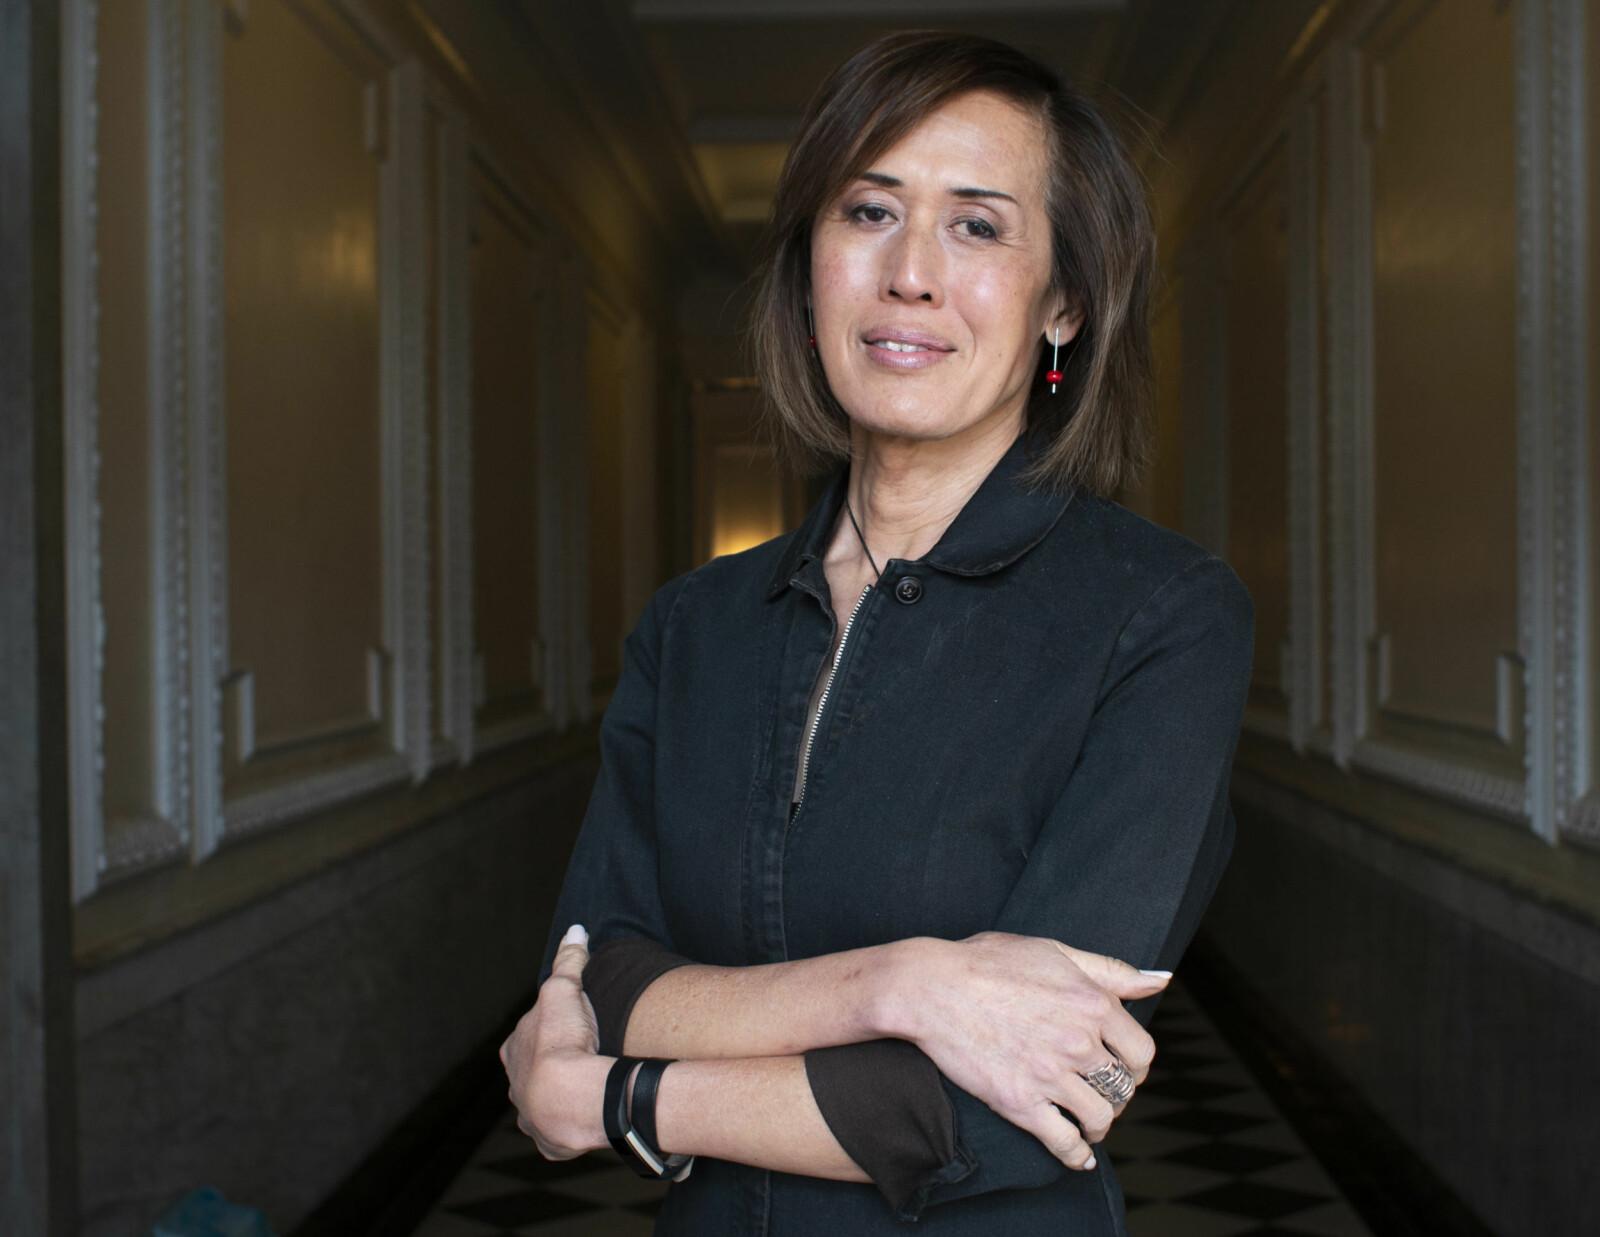 Gina Chua er ny ansvarlig redaktør i nyhetsbyrået Reuters.